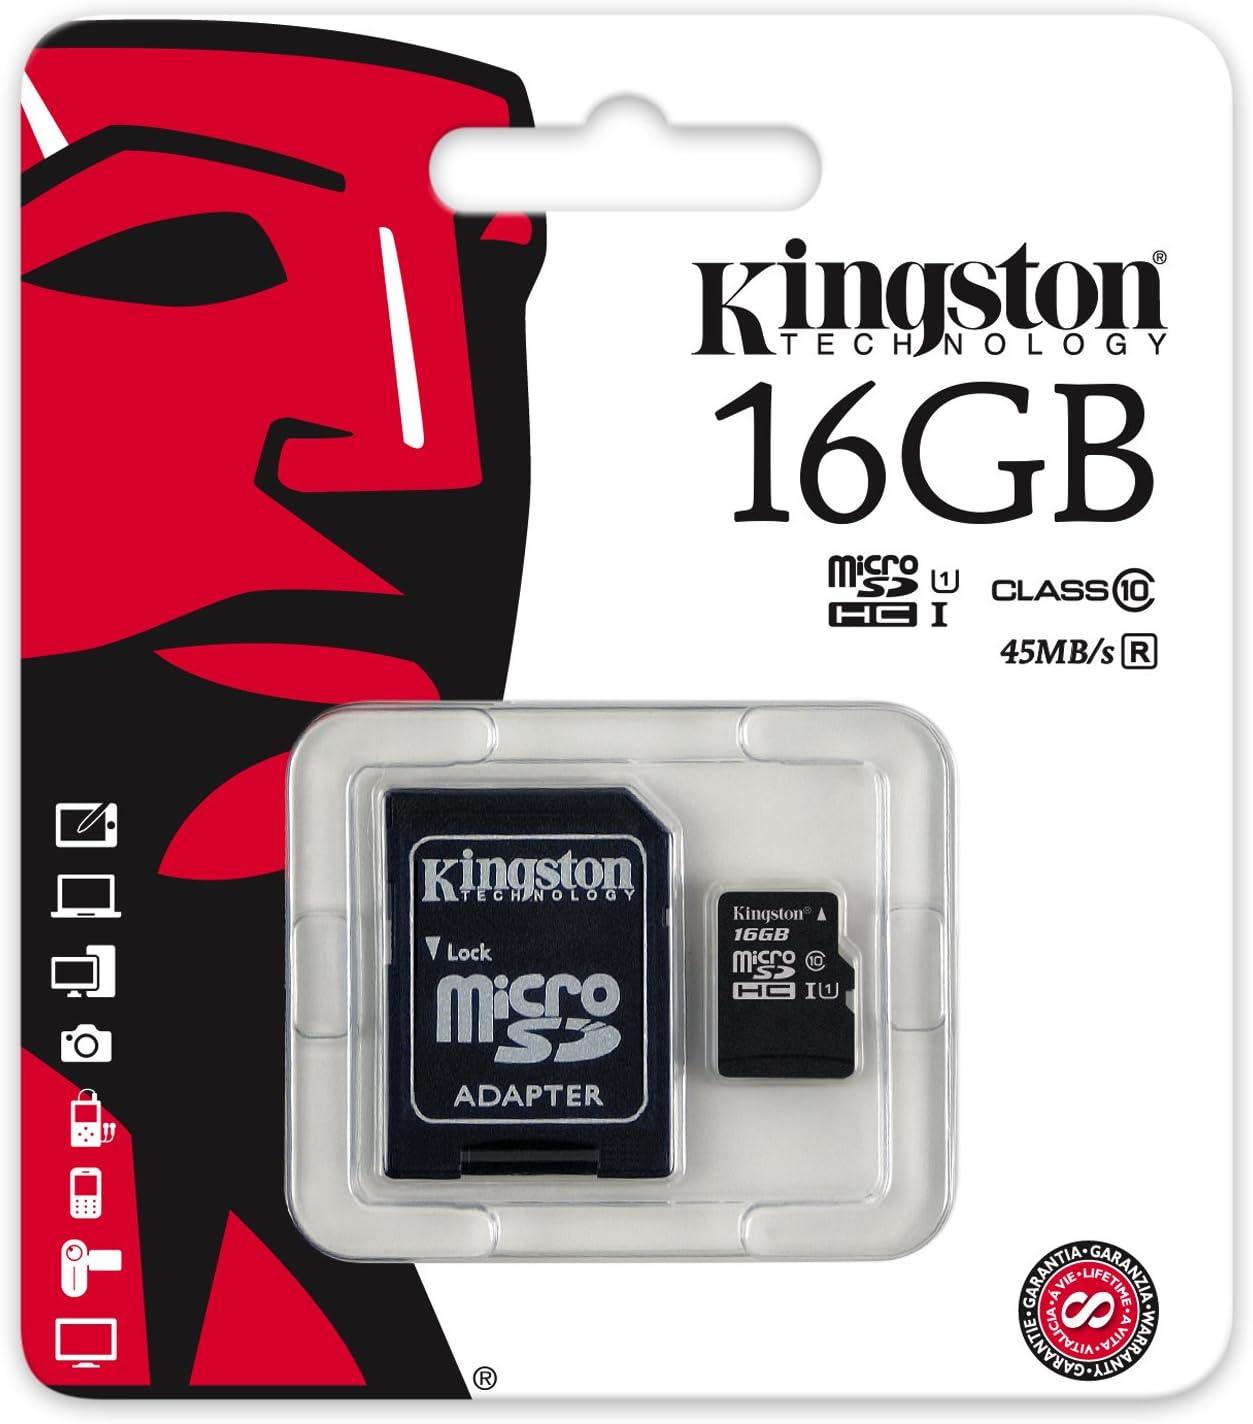 32Mbps // Class 4 Professional Kingston 16GB MicroSDHC Panasonic P31 with custom formatting and Standard SD Adapter!